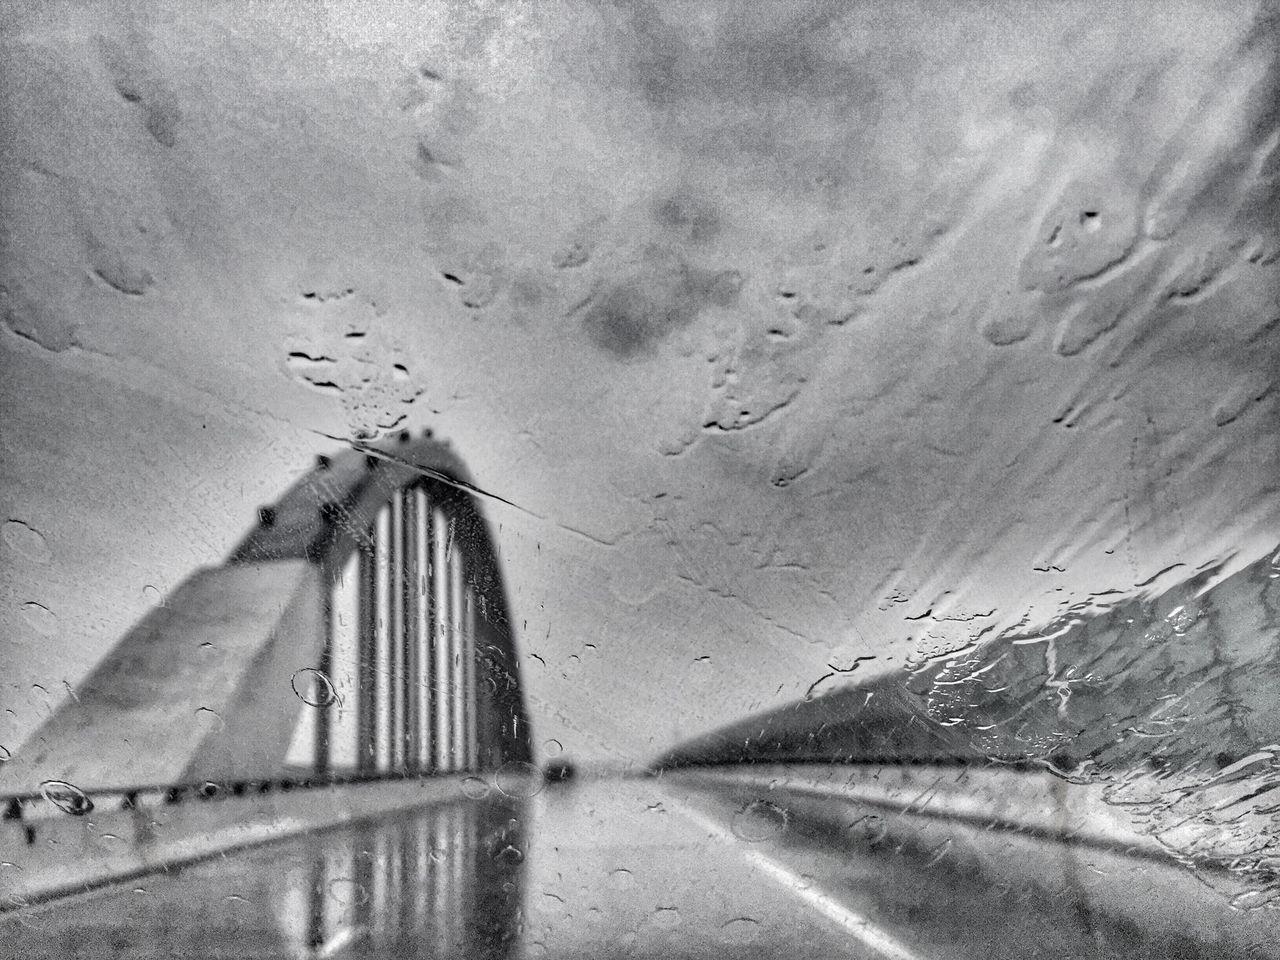 Rain Rainy Days Raindrops On The Road Highway Blackandwhite Black And White Black & White Blackandwhite Photography Black&white Monochrome